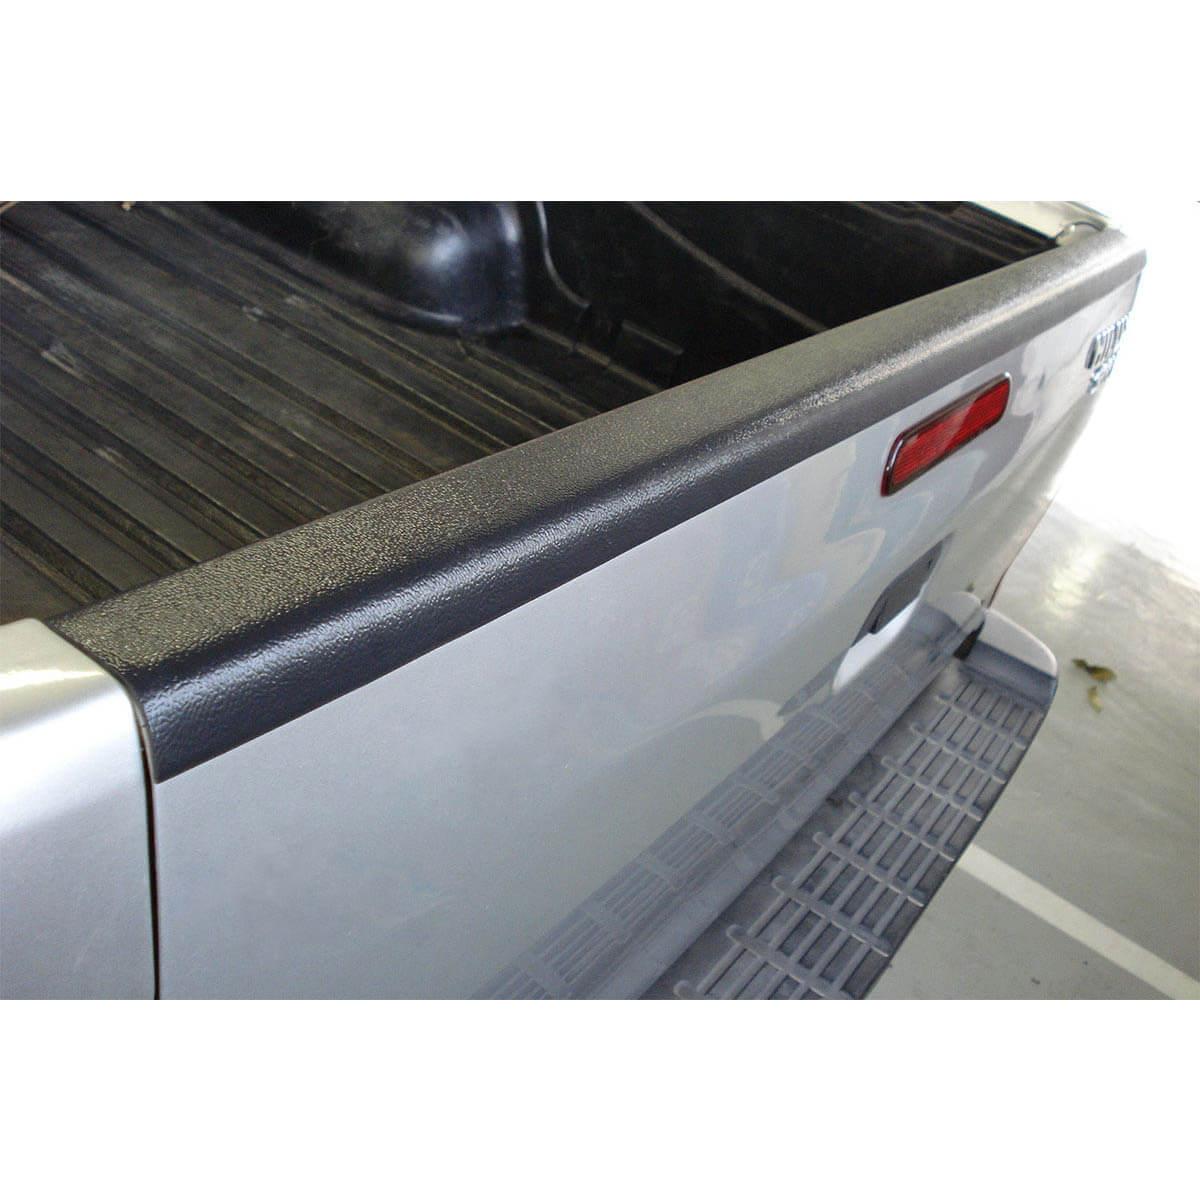 Protetor borda tampa caçamba L200 Triton 2012 a 2018 XB, GL, GLS, GLX e Outdoor MT Diesel